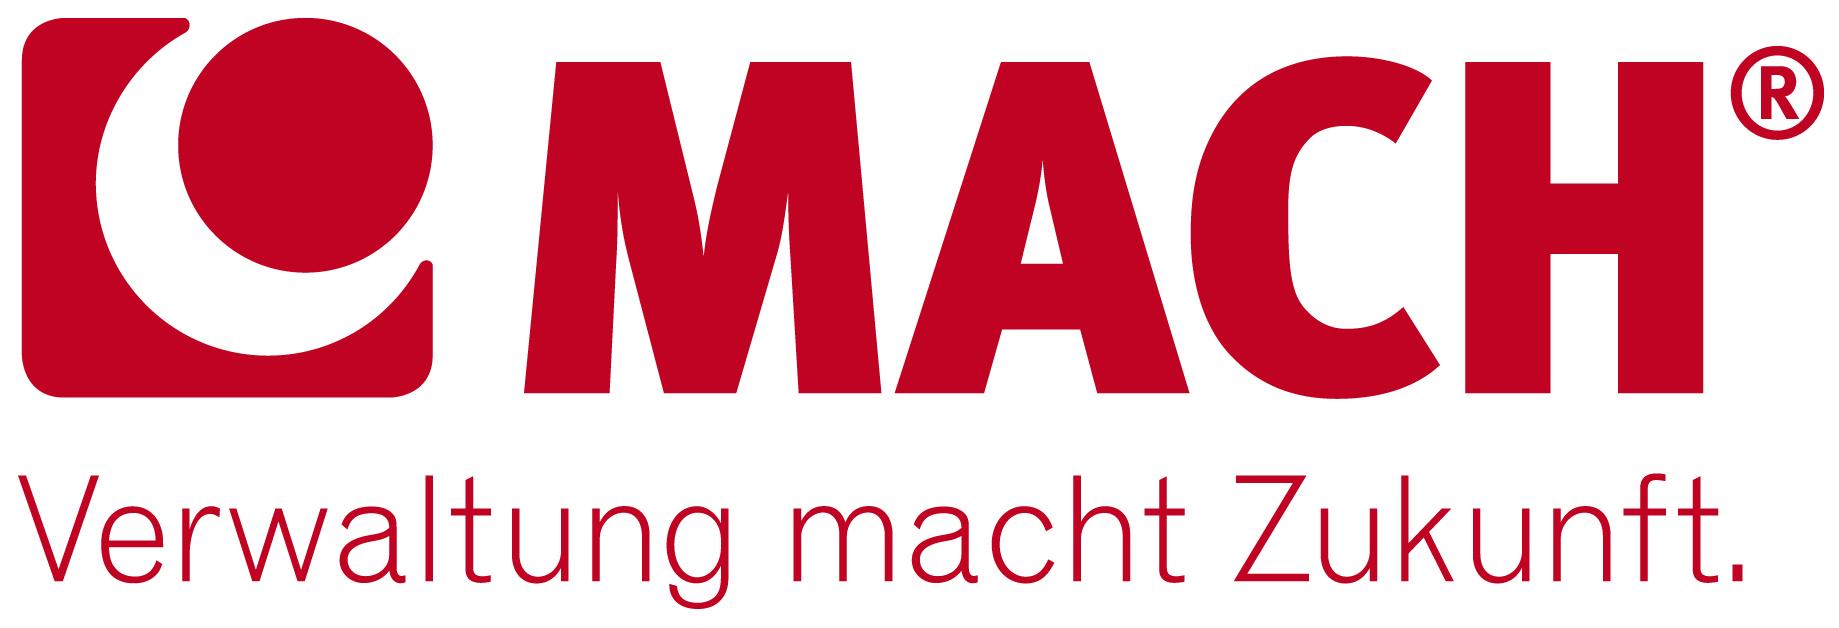 MACH AGLogo Image